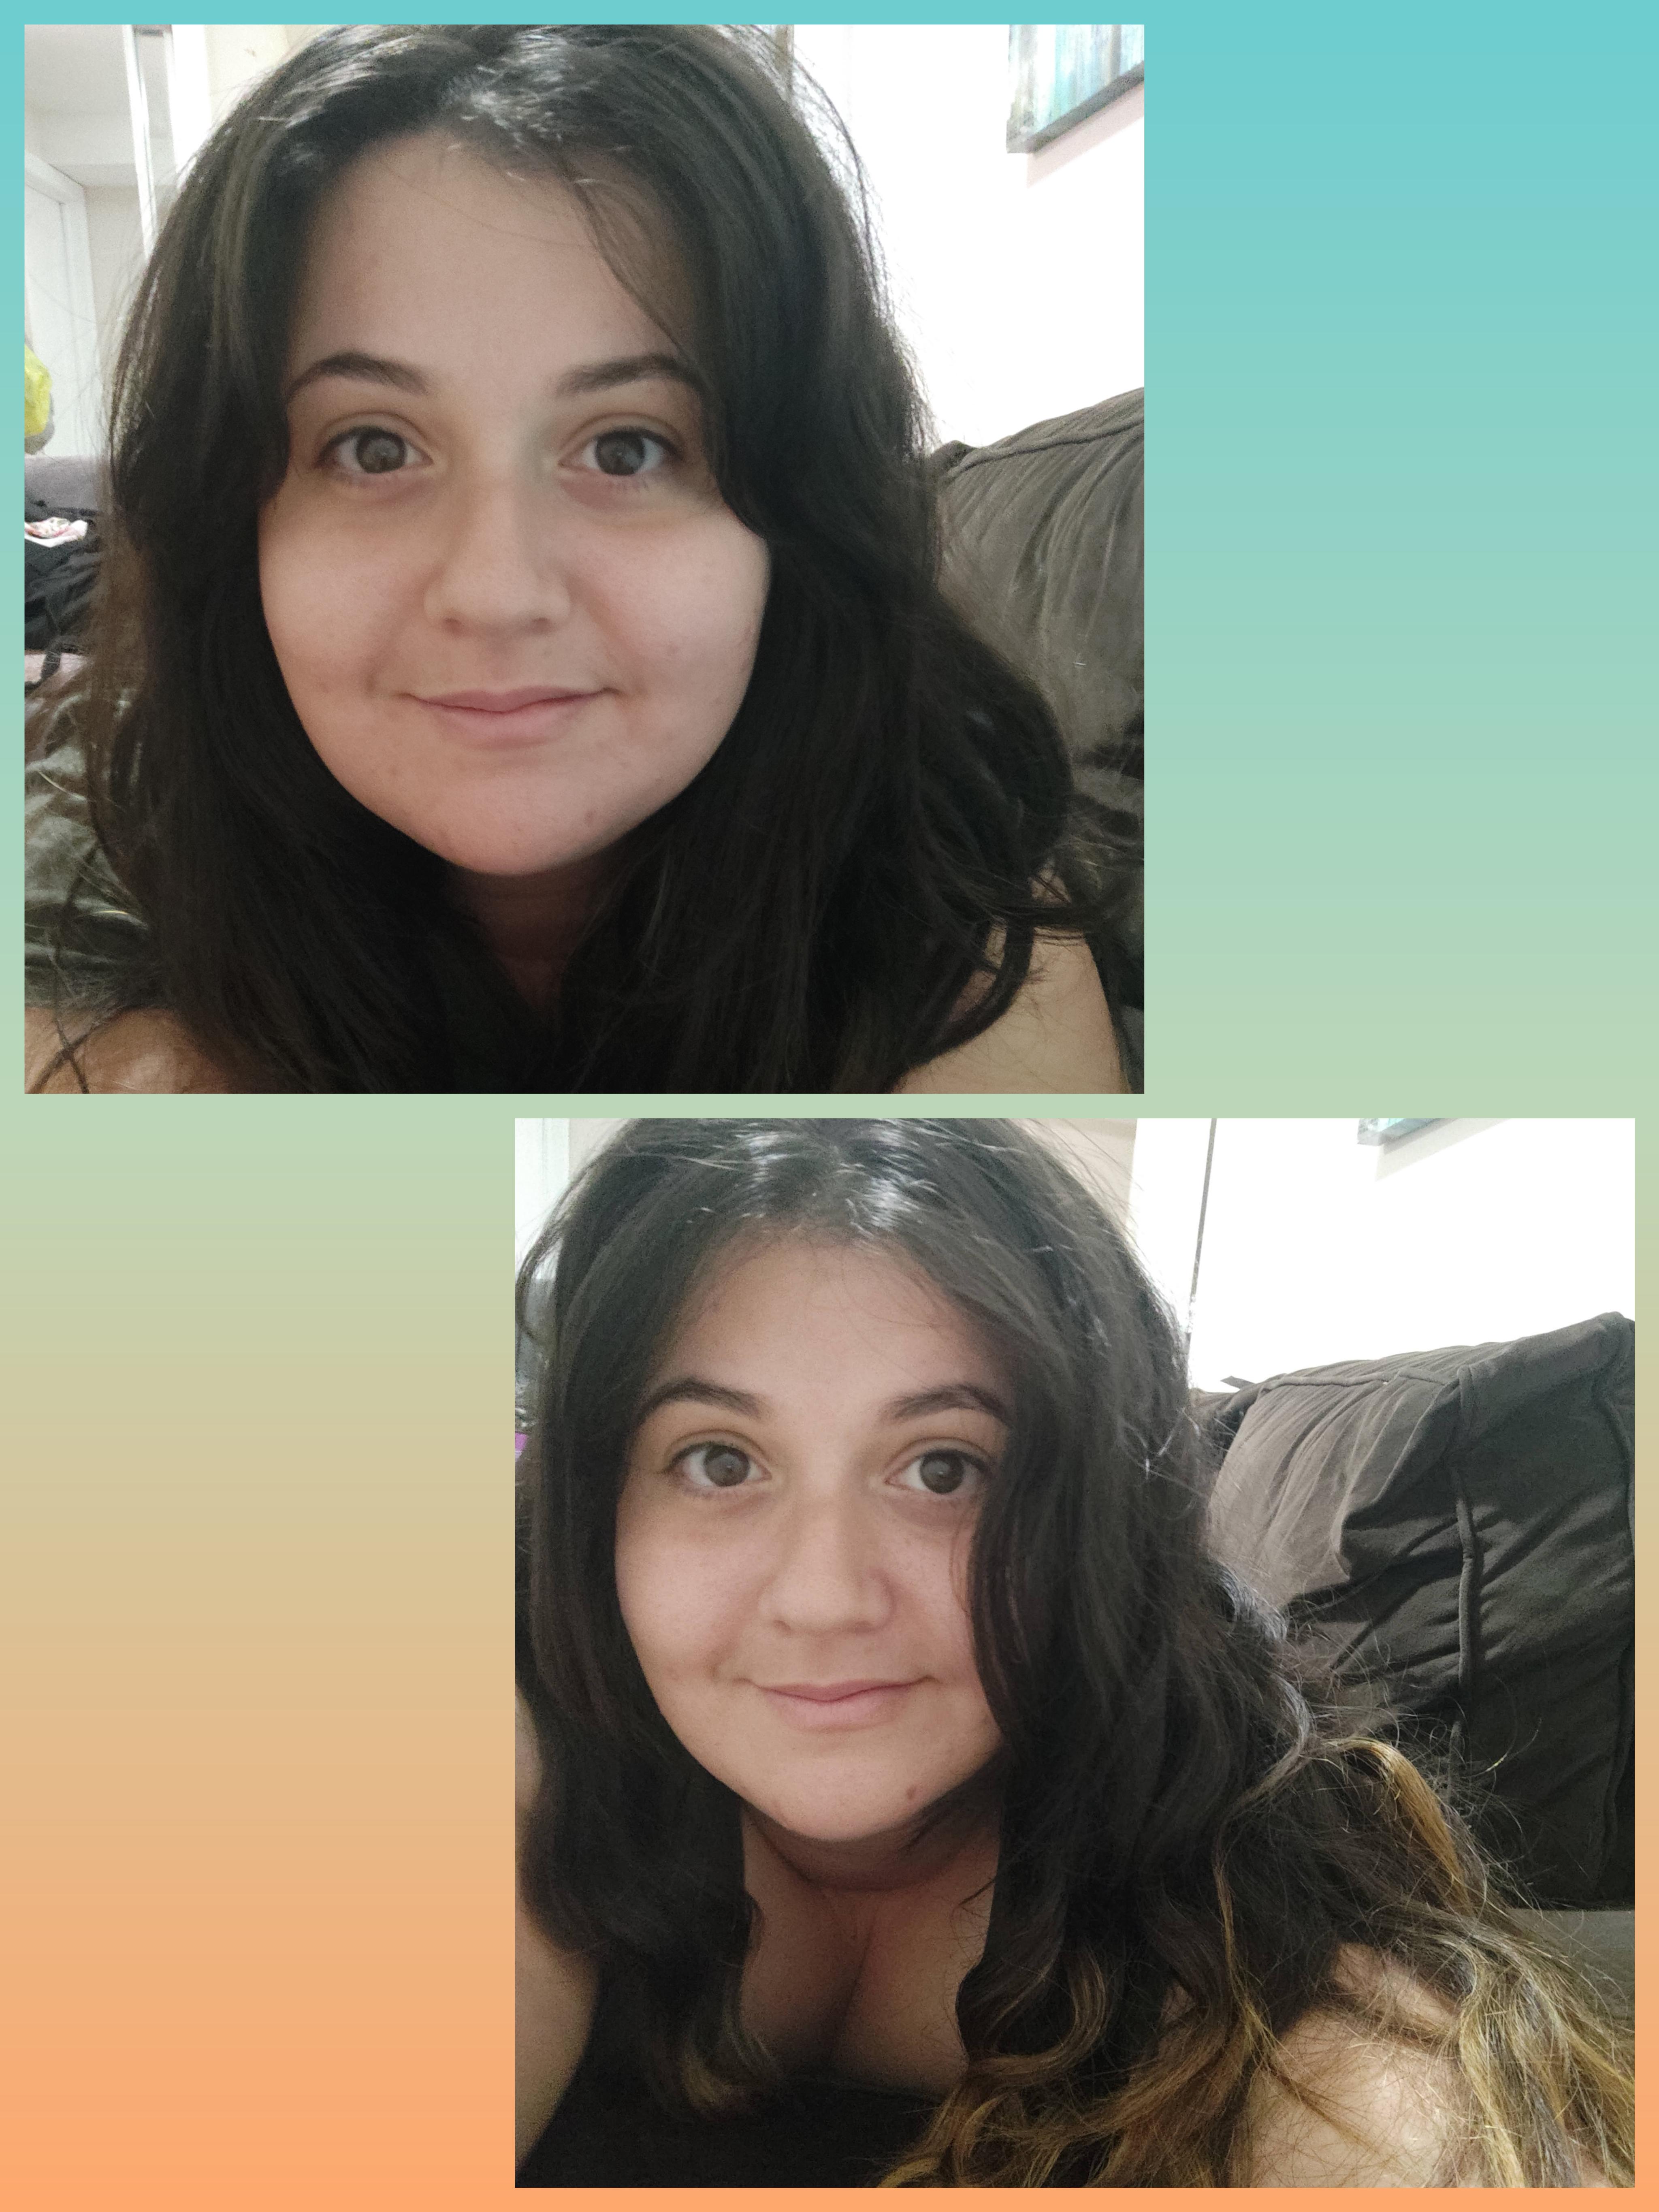 Progress Pics of 25 lbs Weight Loss 5'8 Female 215 lbs to 190 lbs